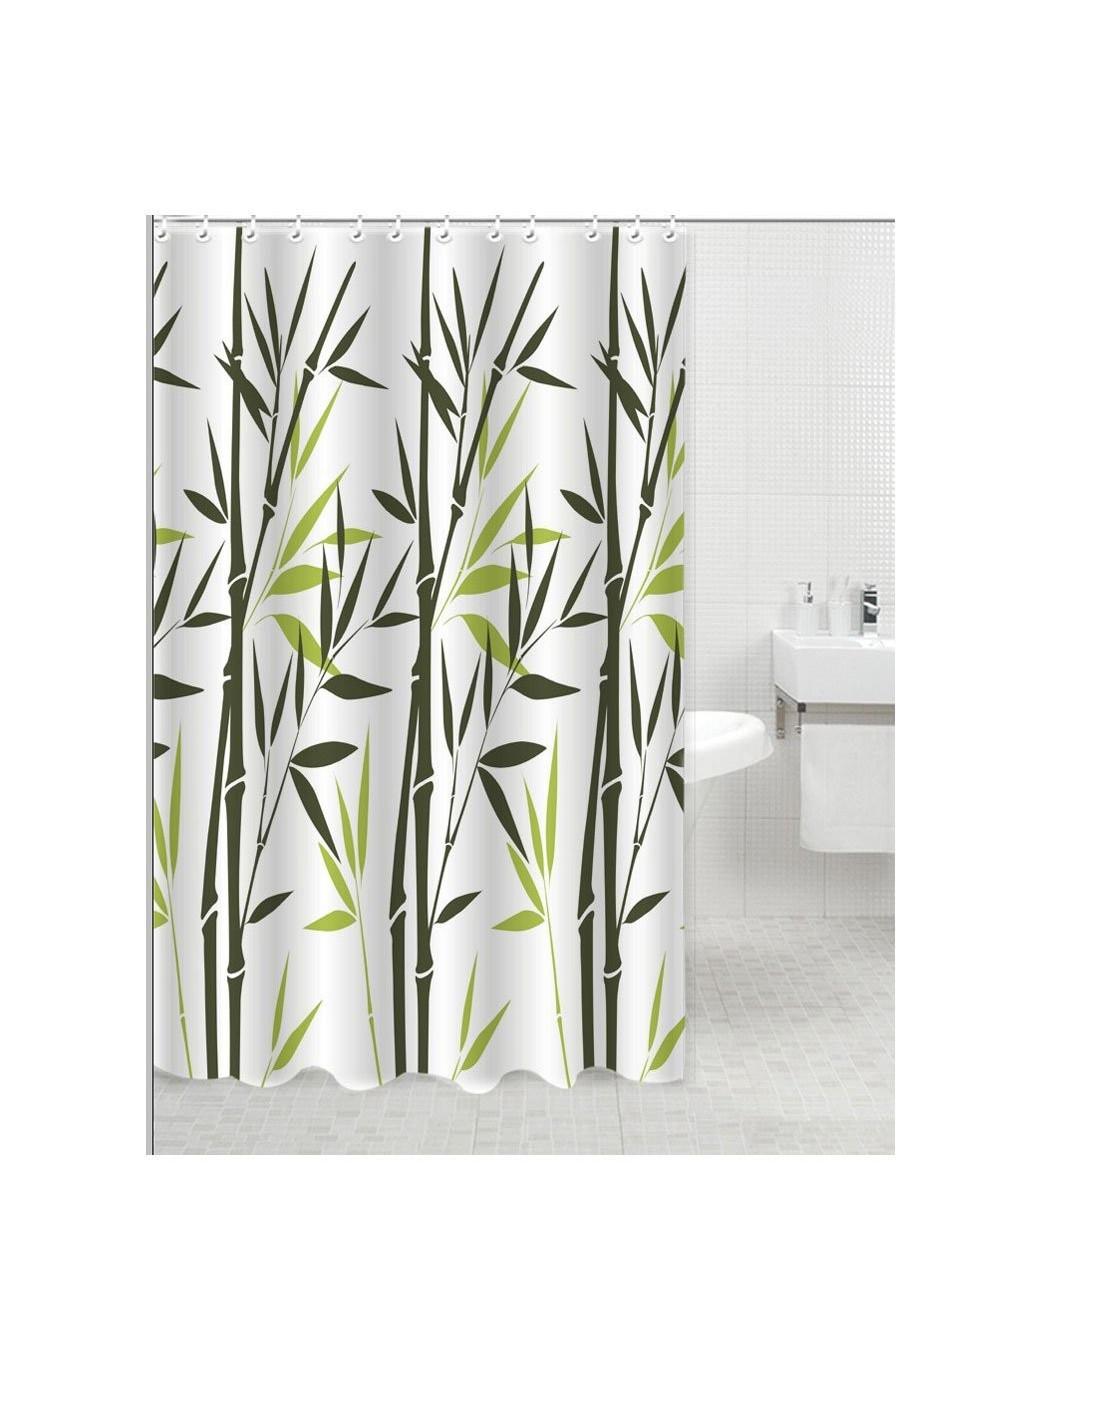 Frandis rideau de douche polyester tige bambou 180x200cm hyper brico - Rideau de douche bambou ...